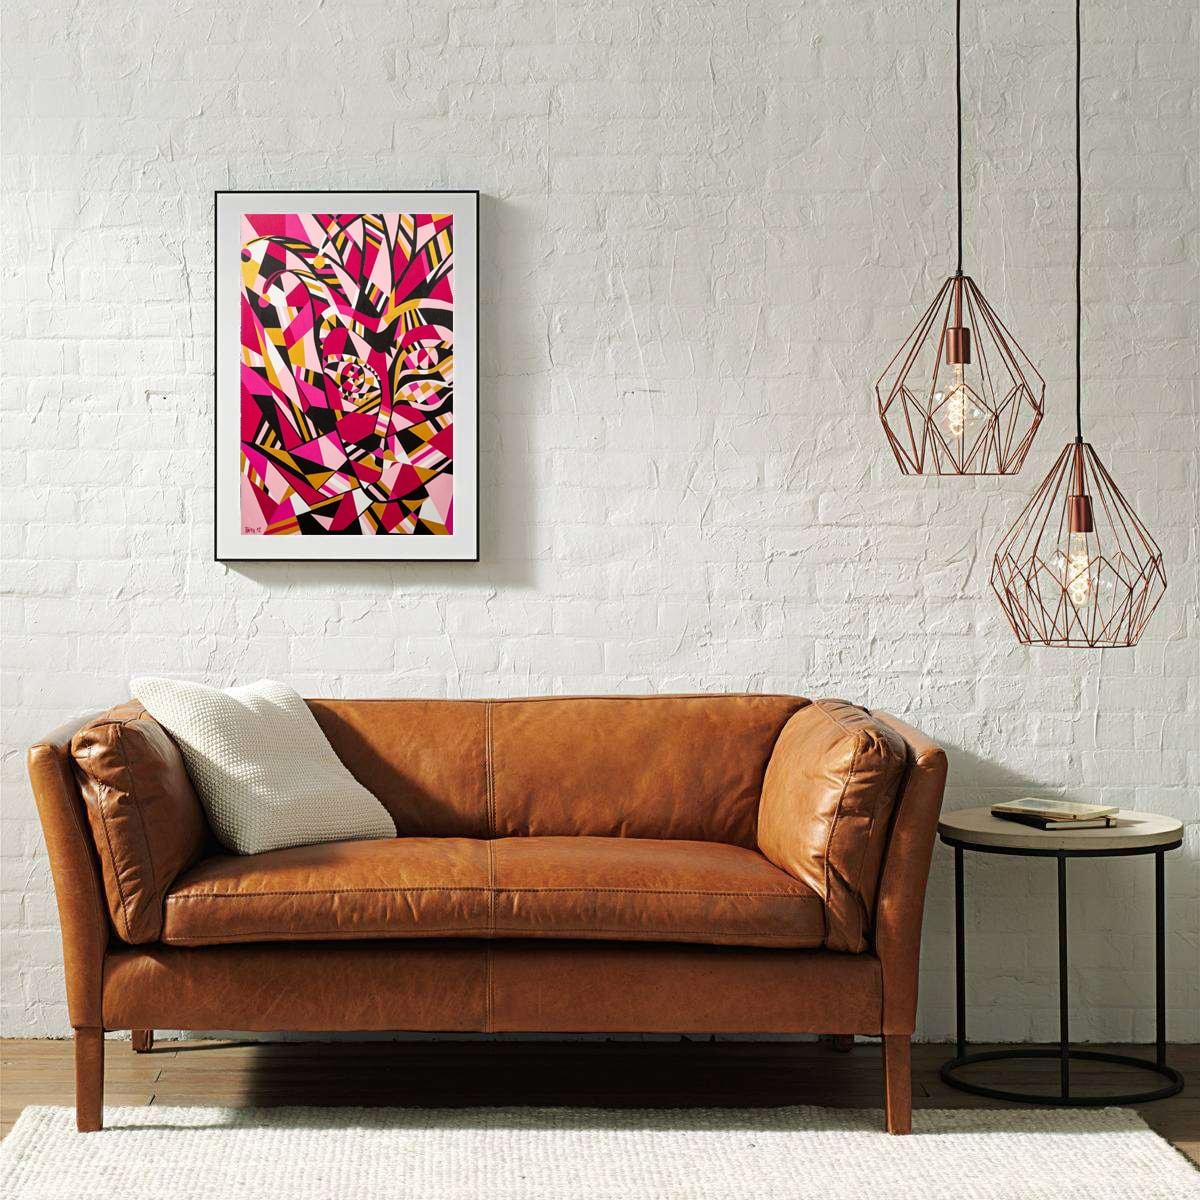 Tarifa Fine Art - Cuadros para decorar tu casa